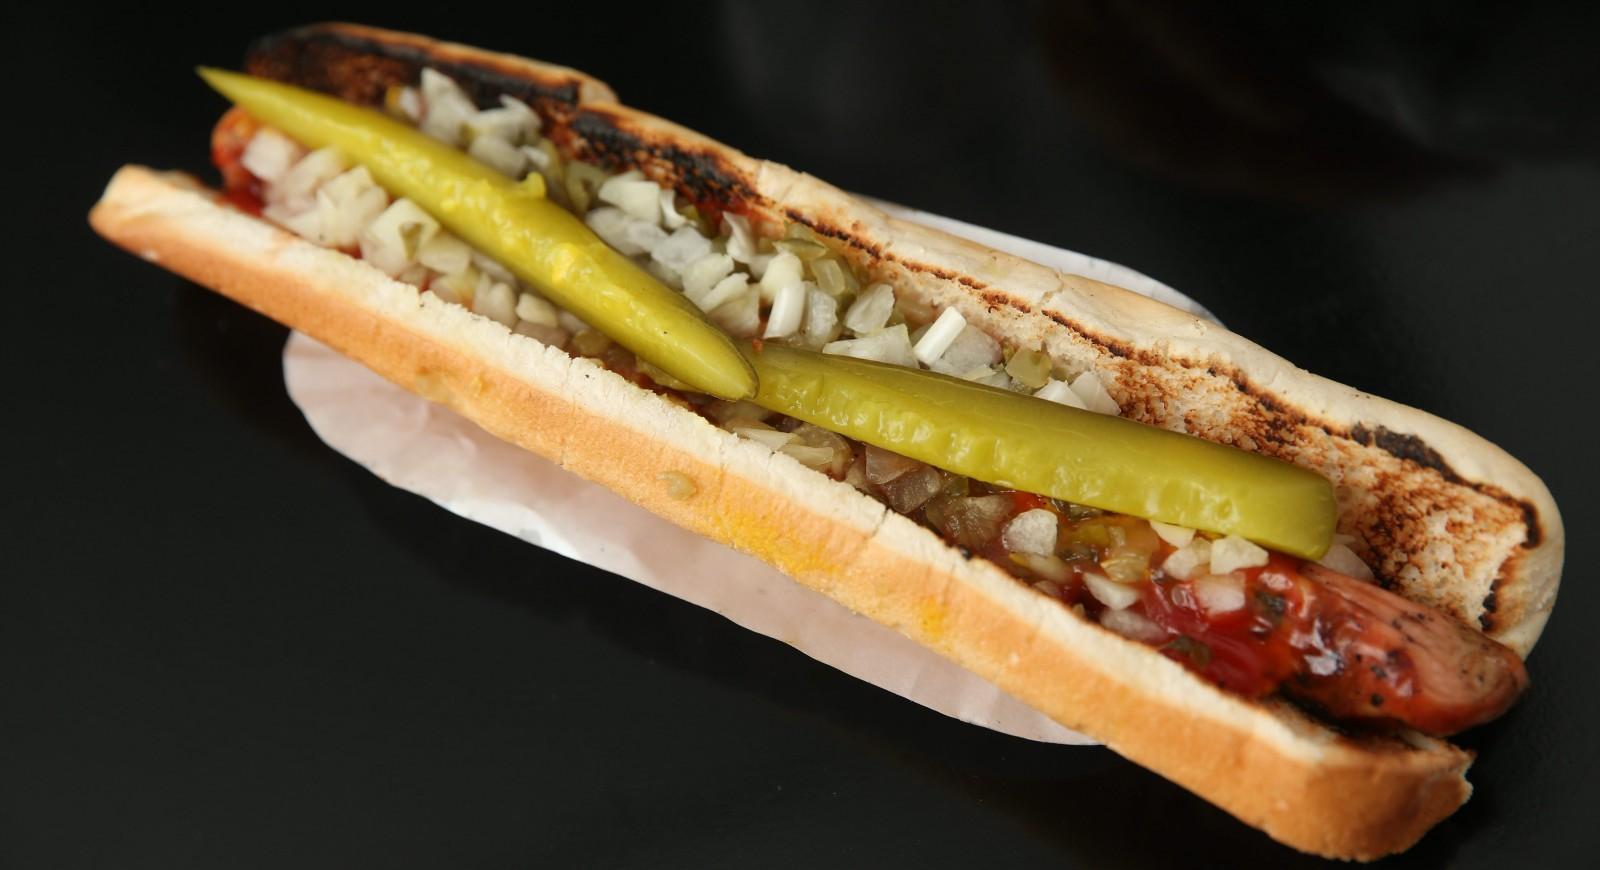 Louie's Hot Dogs' foot-long has mustard, ketchup, relish, onions and pickles. (Sharon Cantillon/Buffalo News)